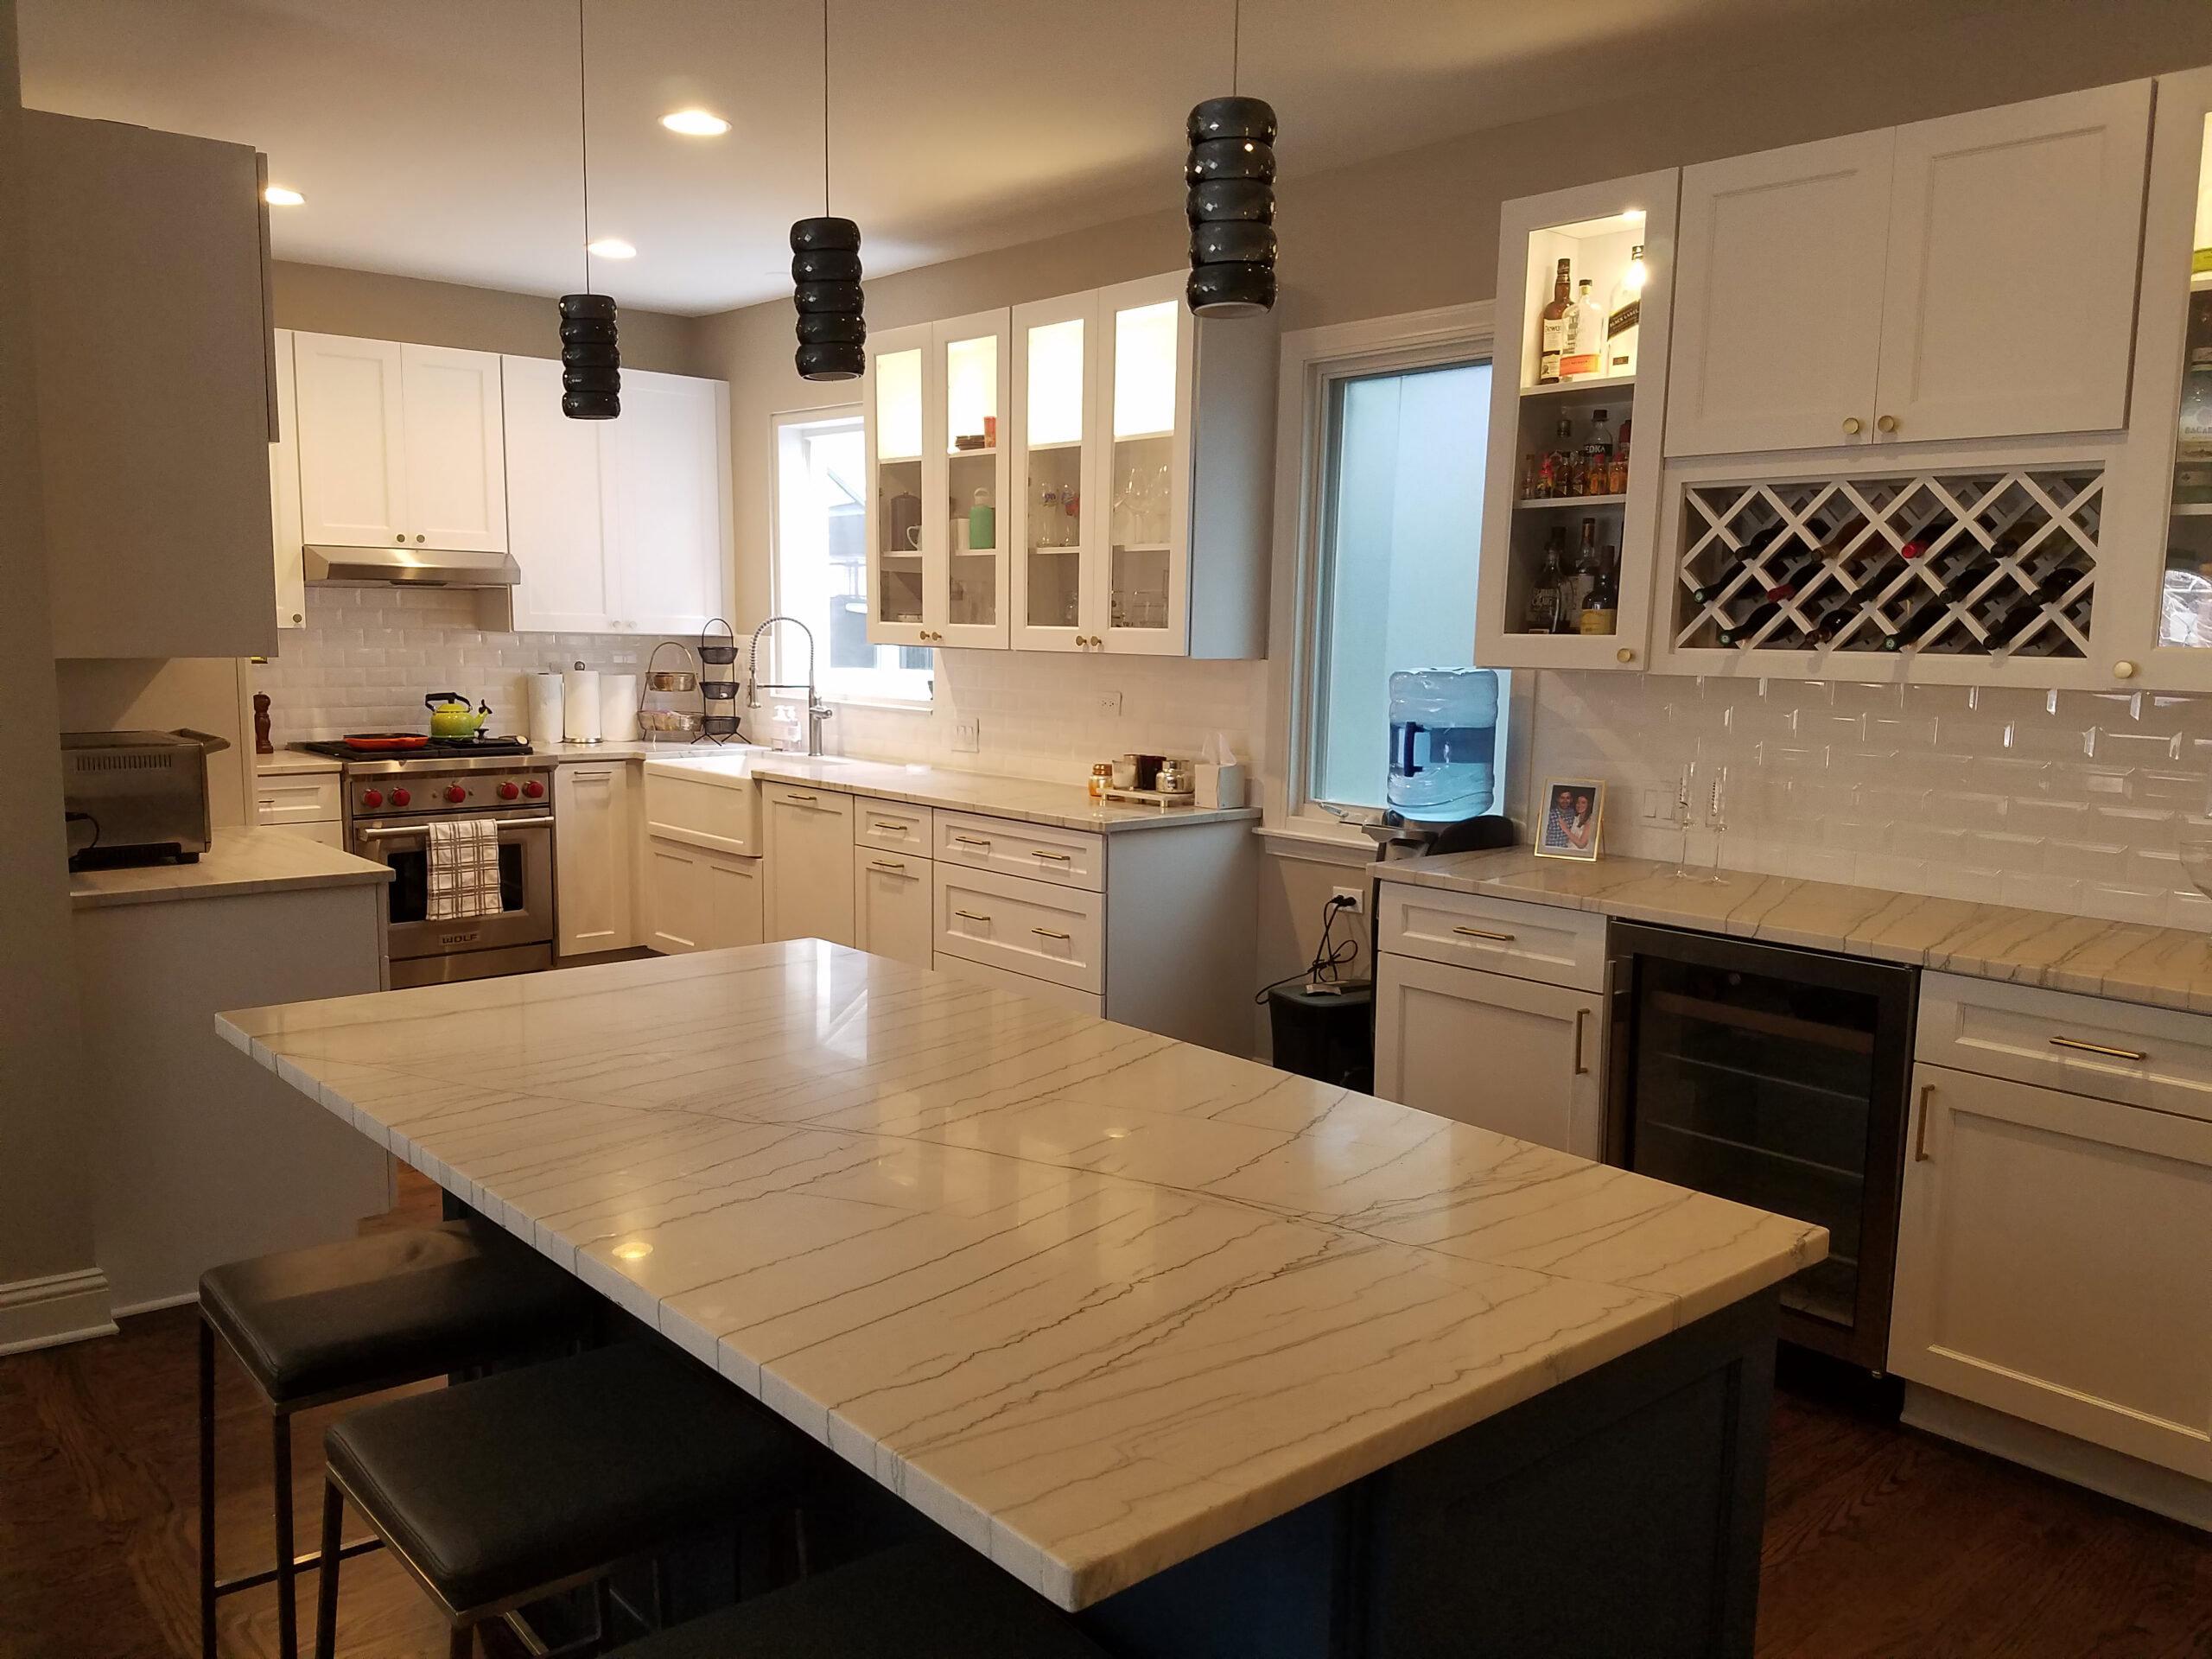 near north side kitchen remodel